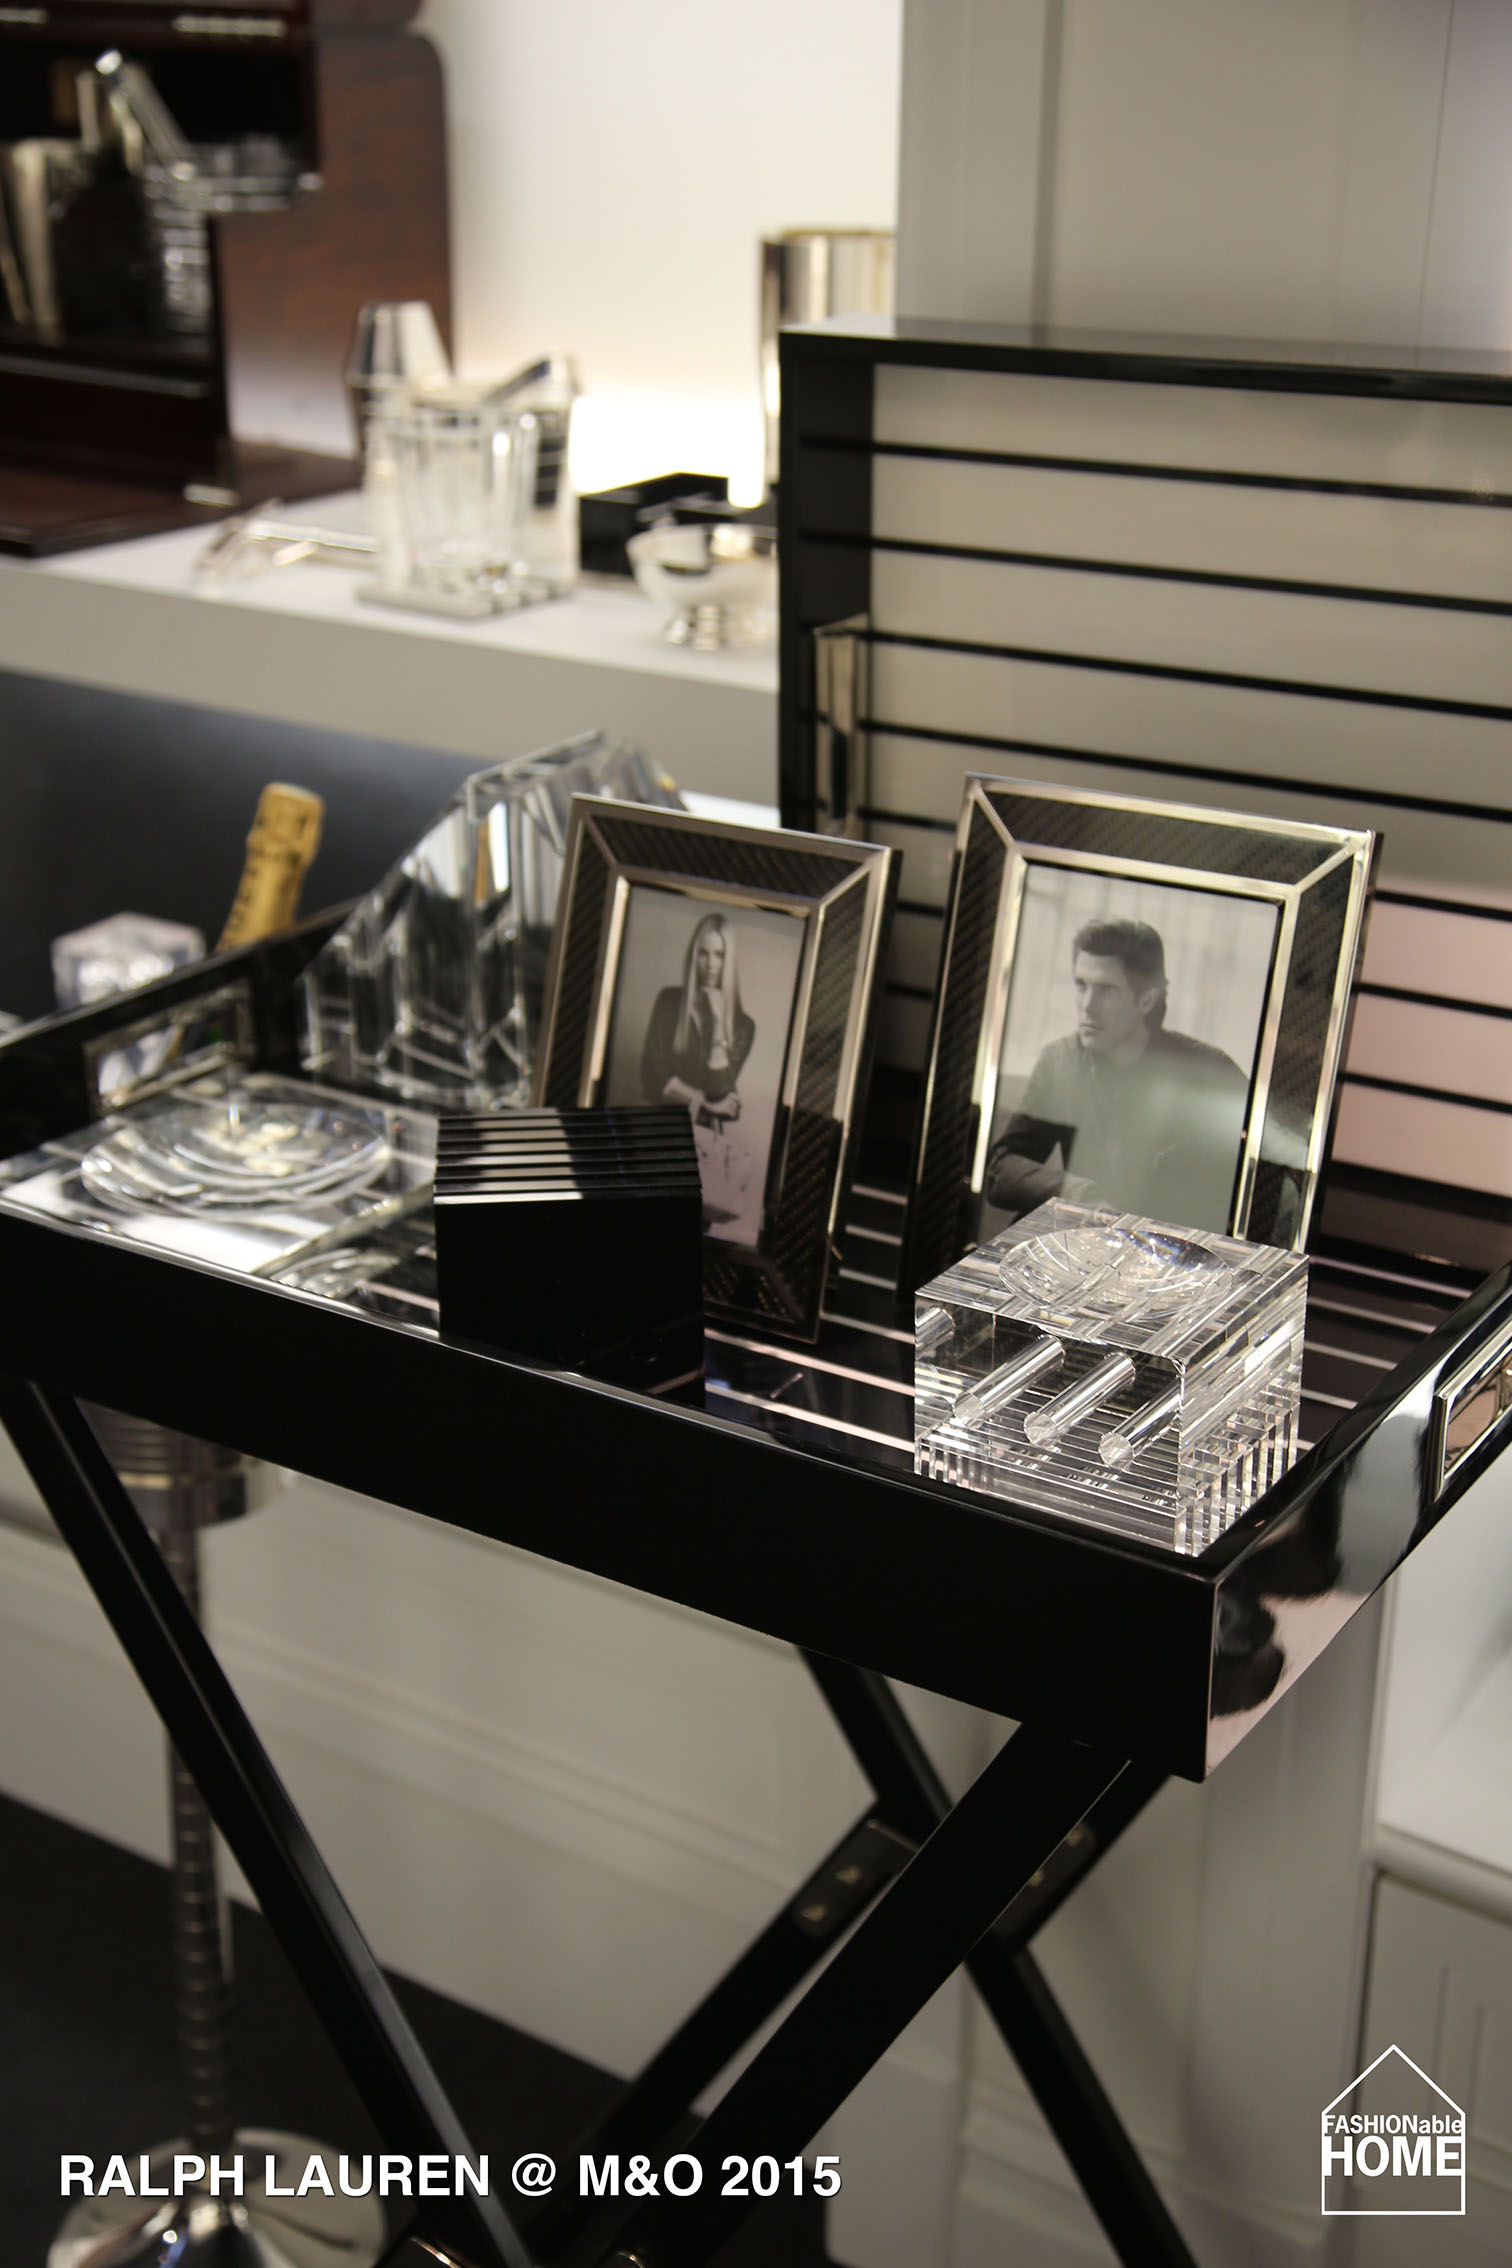 RALPH LAUREN HOME @ M&O 2015   Fashionable Home Blog on 2015 oscar de la renta collection, 2015 tommy hilfiger collection, 2015 jimmy choo collection, 2015 valentino collection, 2015 tory burch collection,